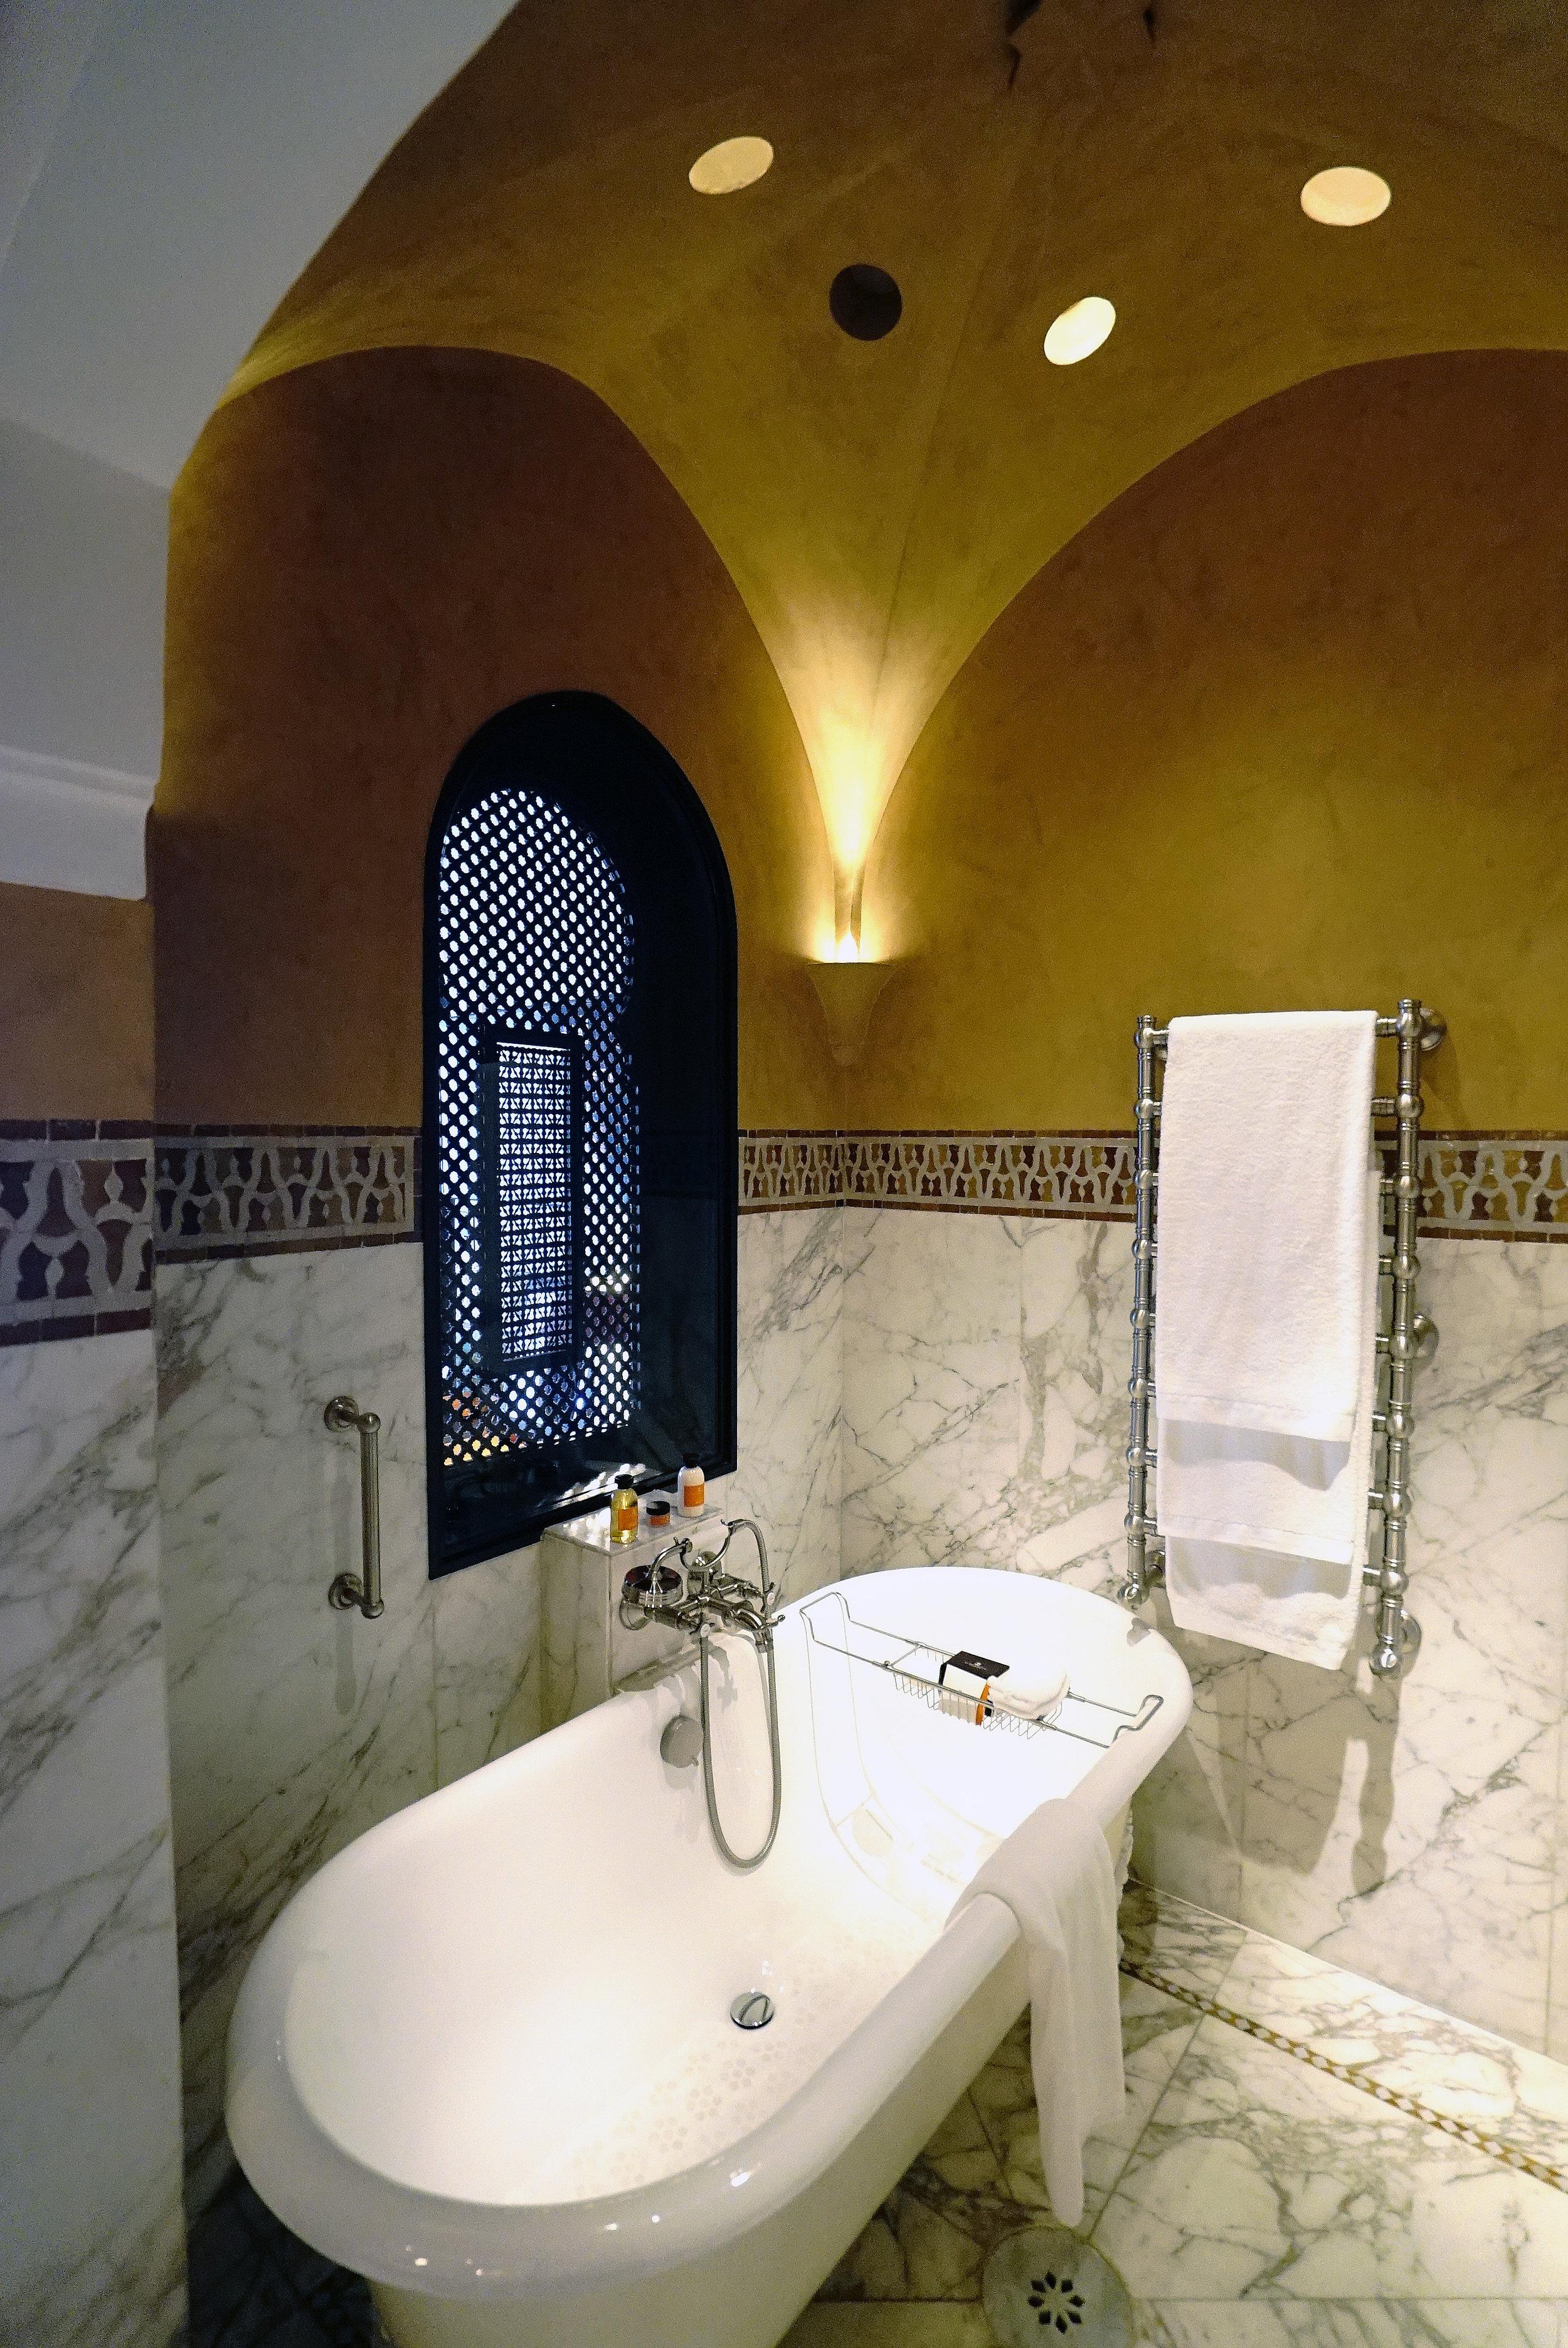 La Mamounia Morocco Bathroom 1.jpg